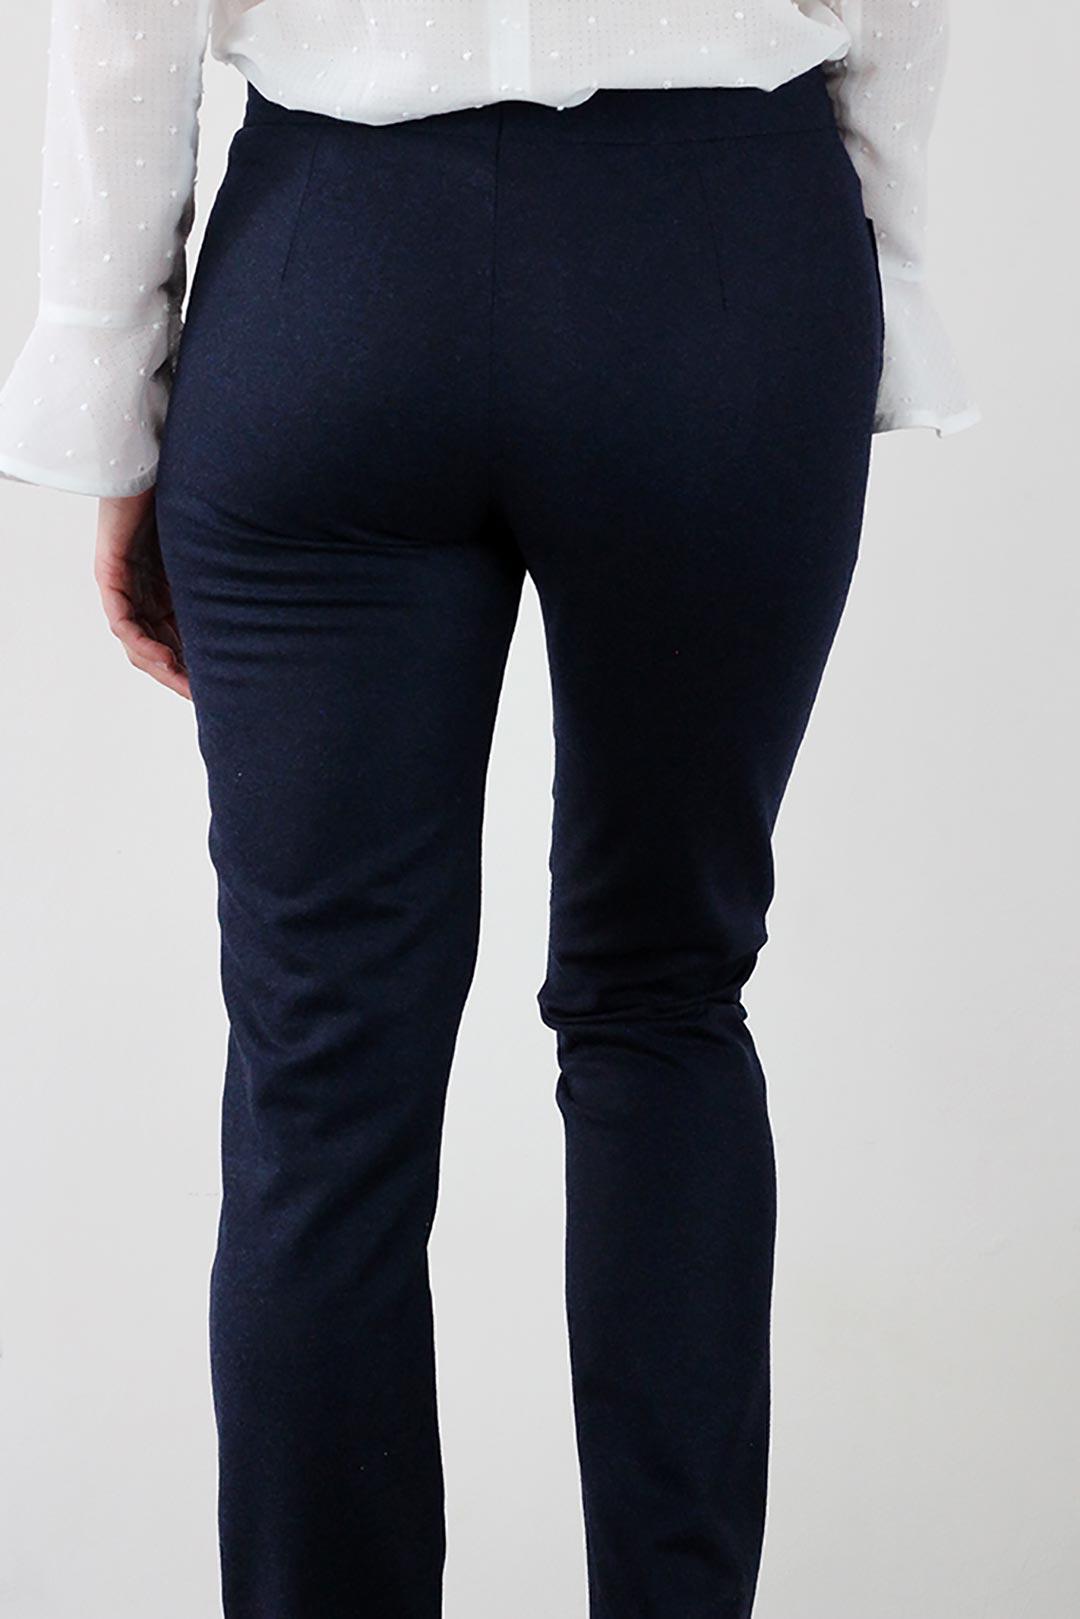 pantalon flanelle femme